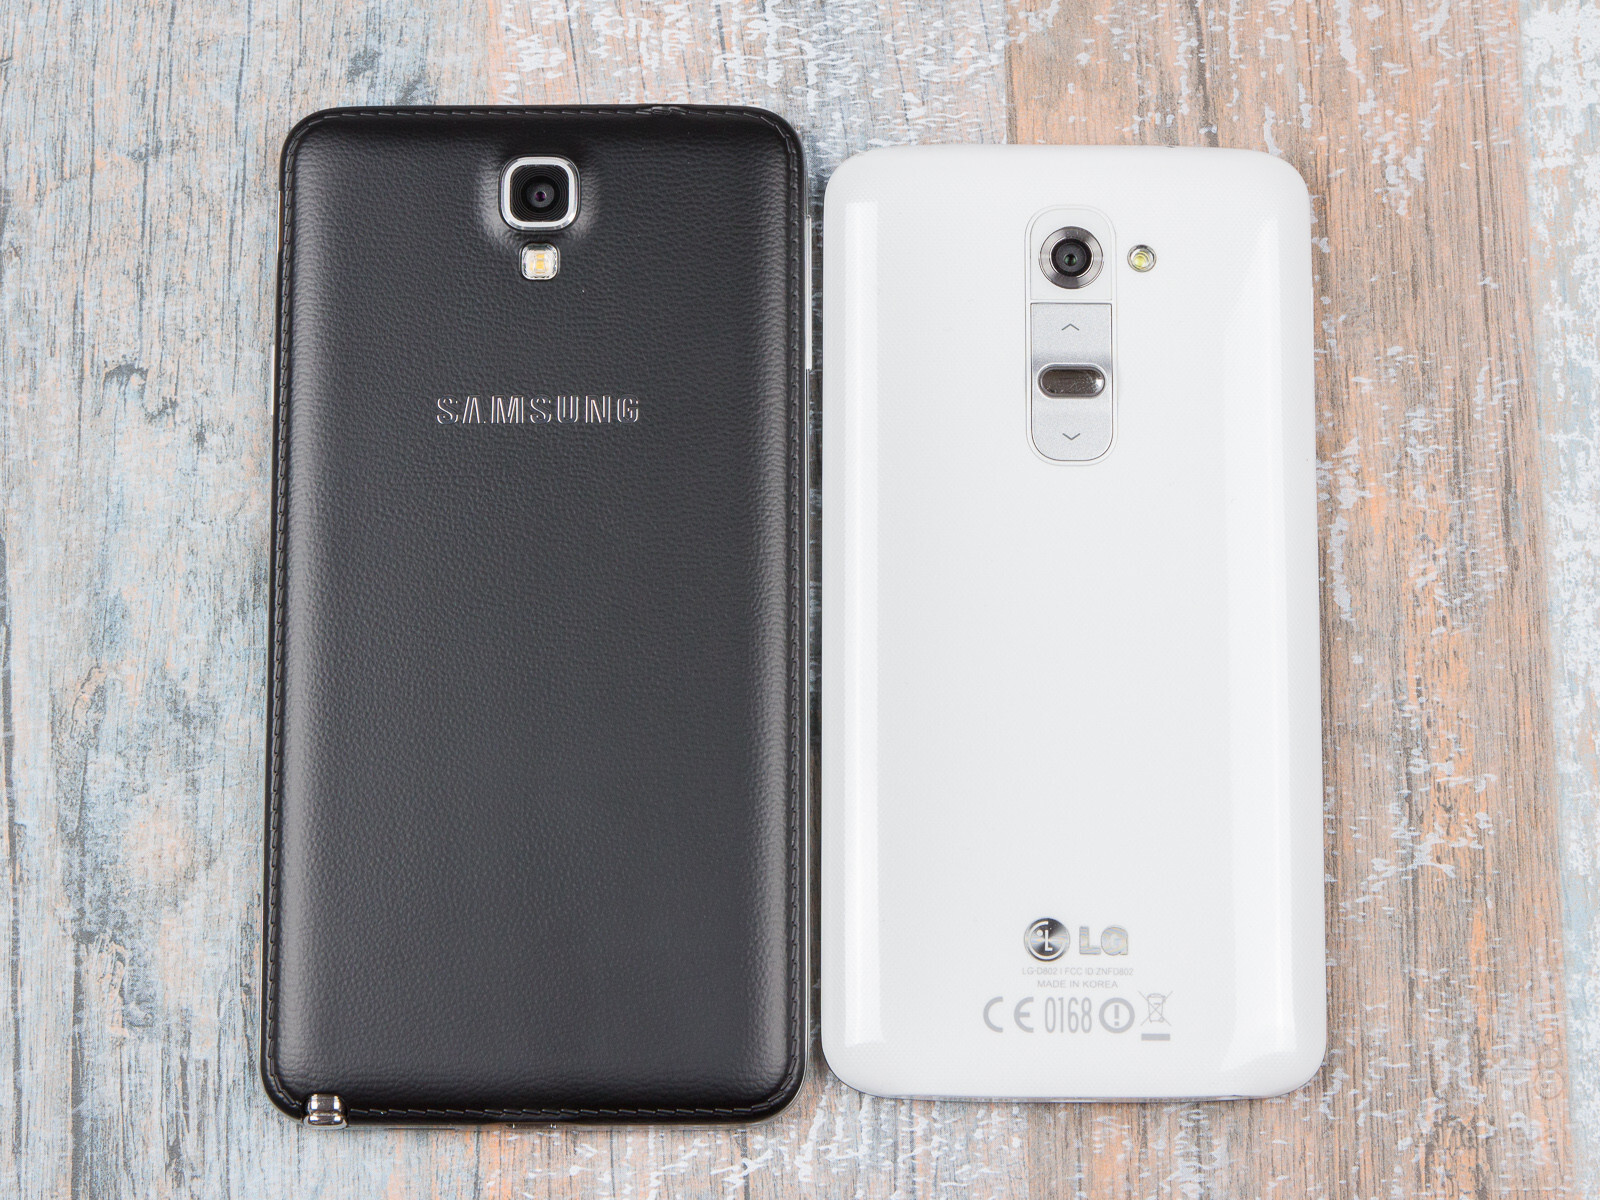 Samsung Galaxy Note 3 Neo vs Note 3 Samsung Galaxy Note 3 Neo vs